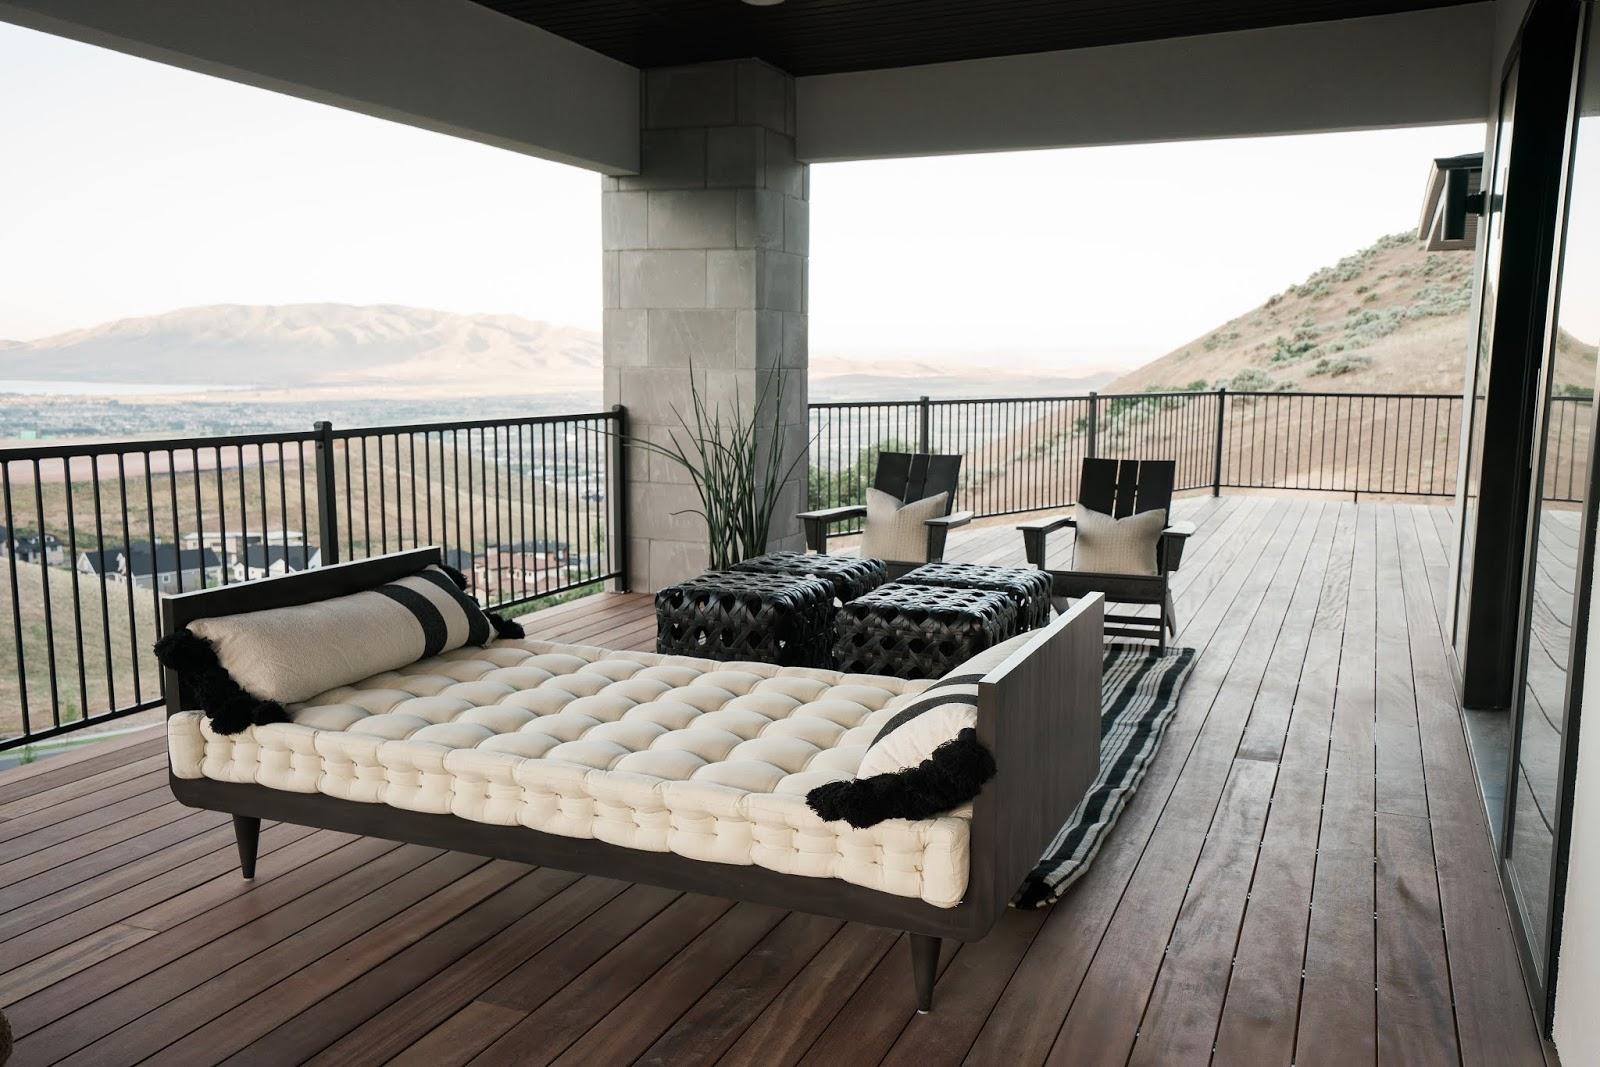 Outdoor Modern Furniture, Deck Furniture